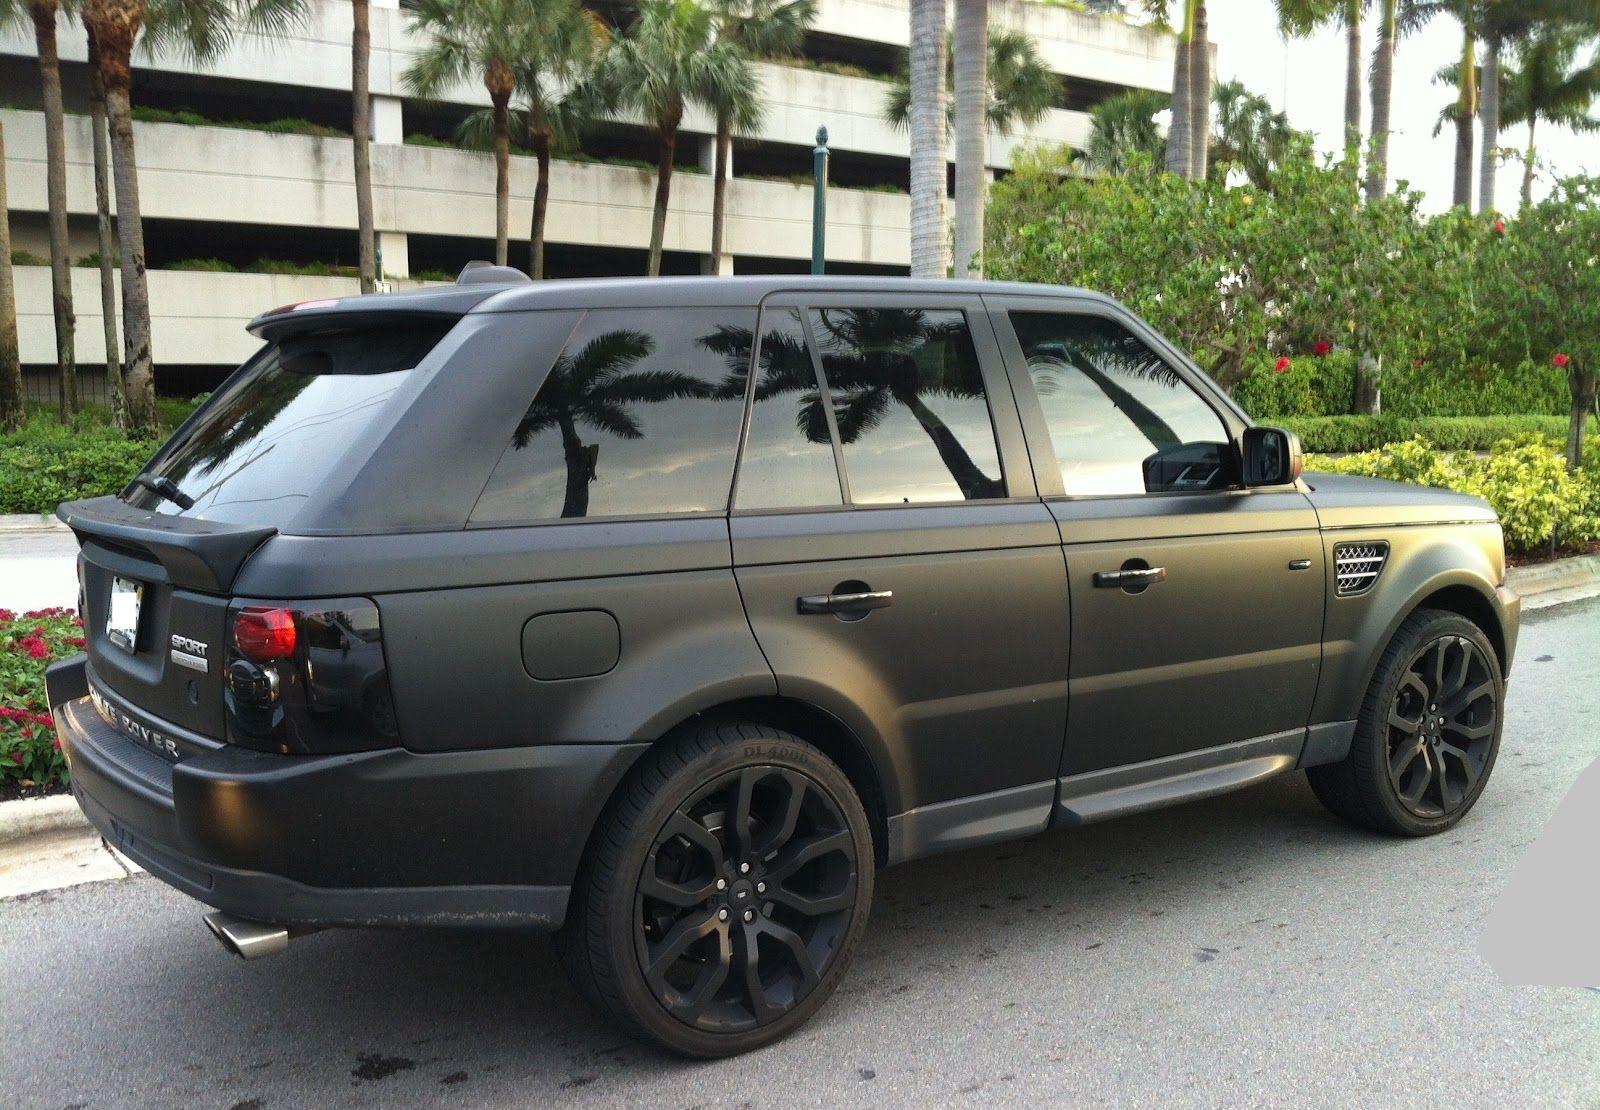 Matte Range Rover >> Matte Black Range Rover Sport Want This For The Husband